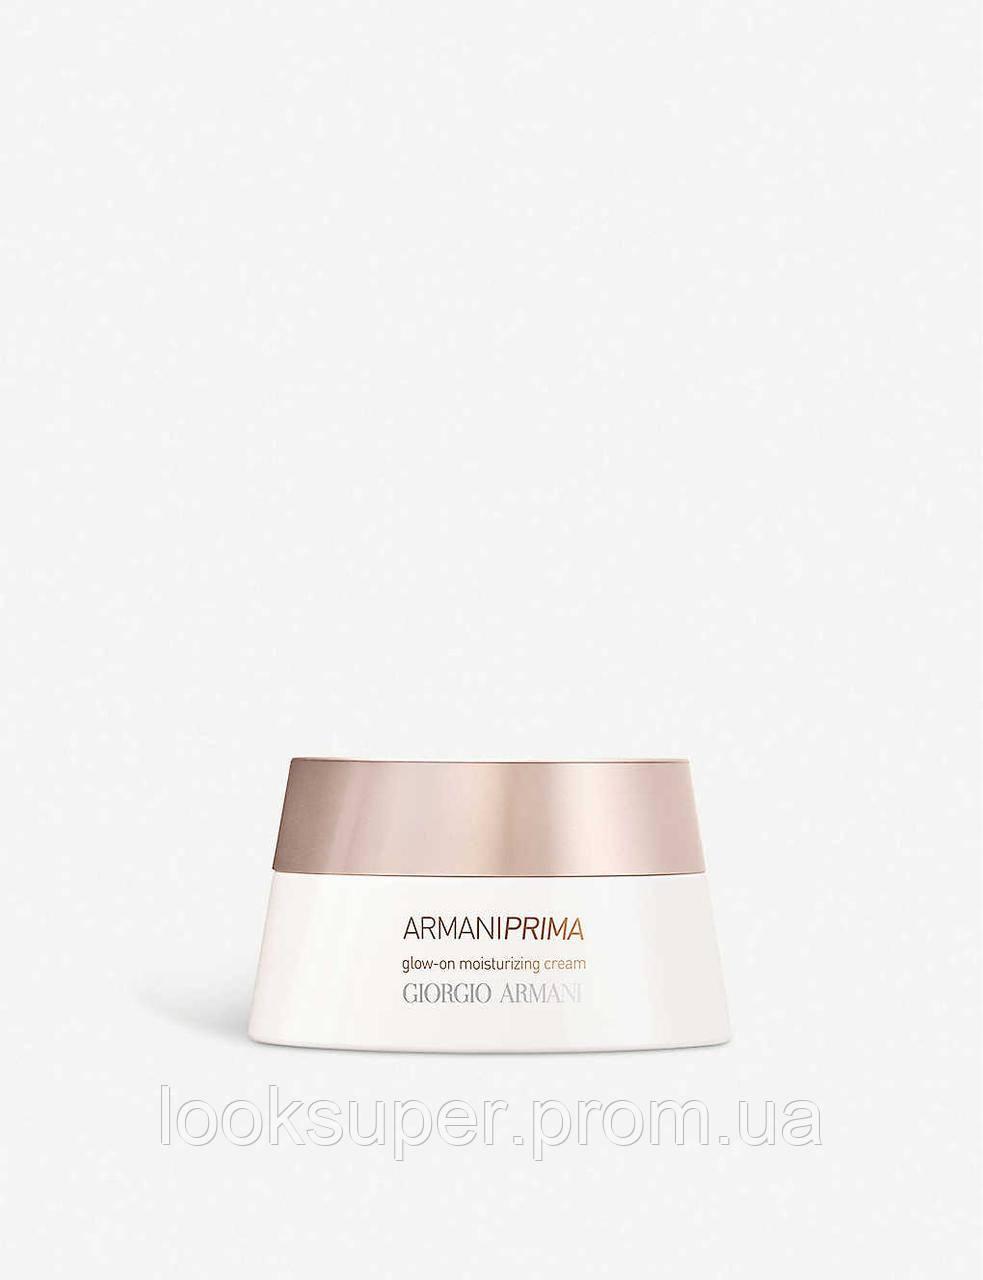 Увлажняющий крем Giorgio Armani Armani Prima glow-on moisturising cream (50ml)